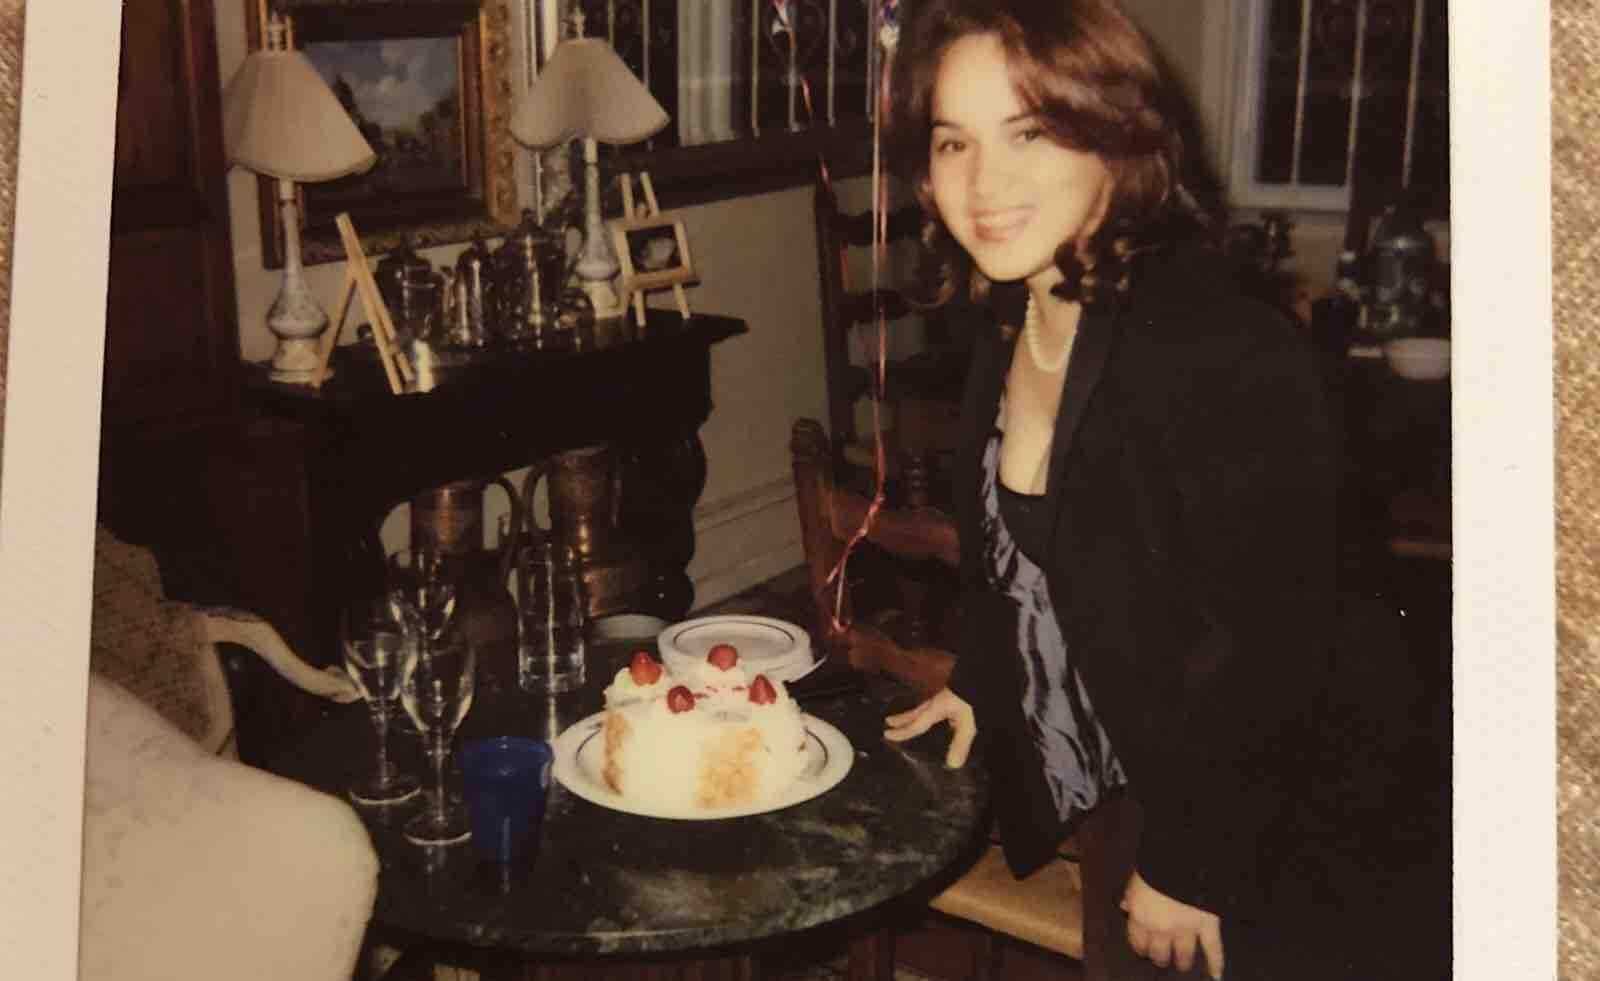 Fundraiser by Andrea Parra : Cristina's treatment for AML leukemia